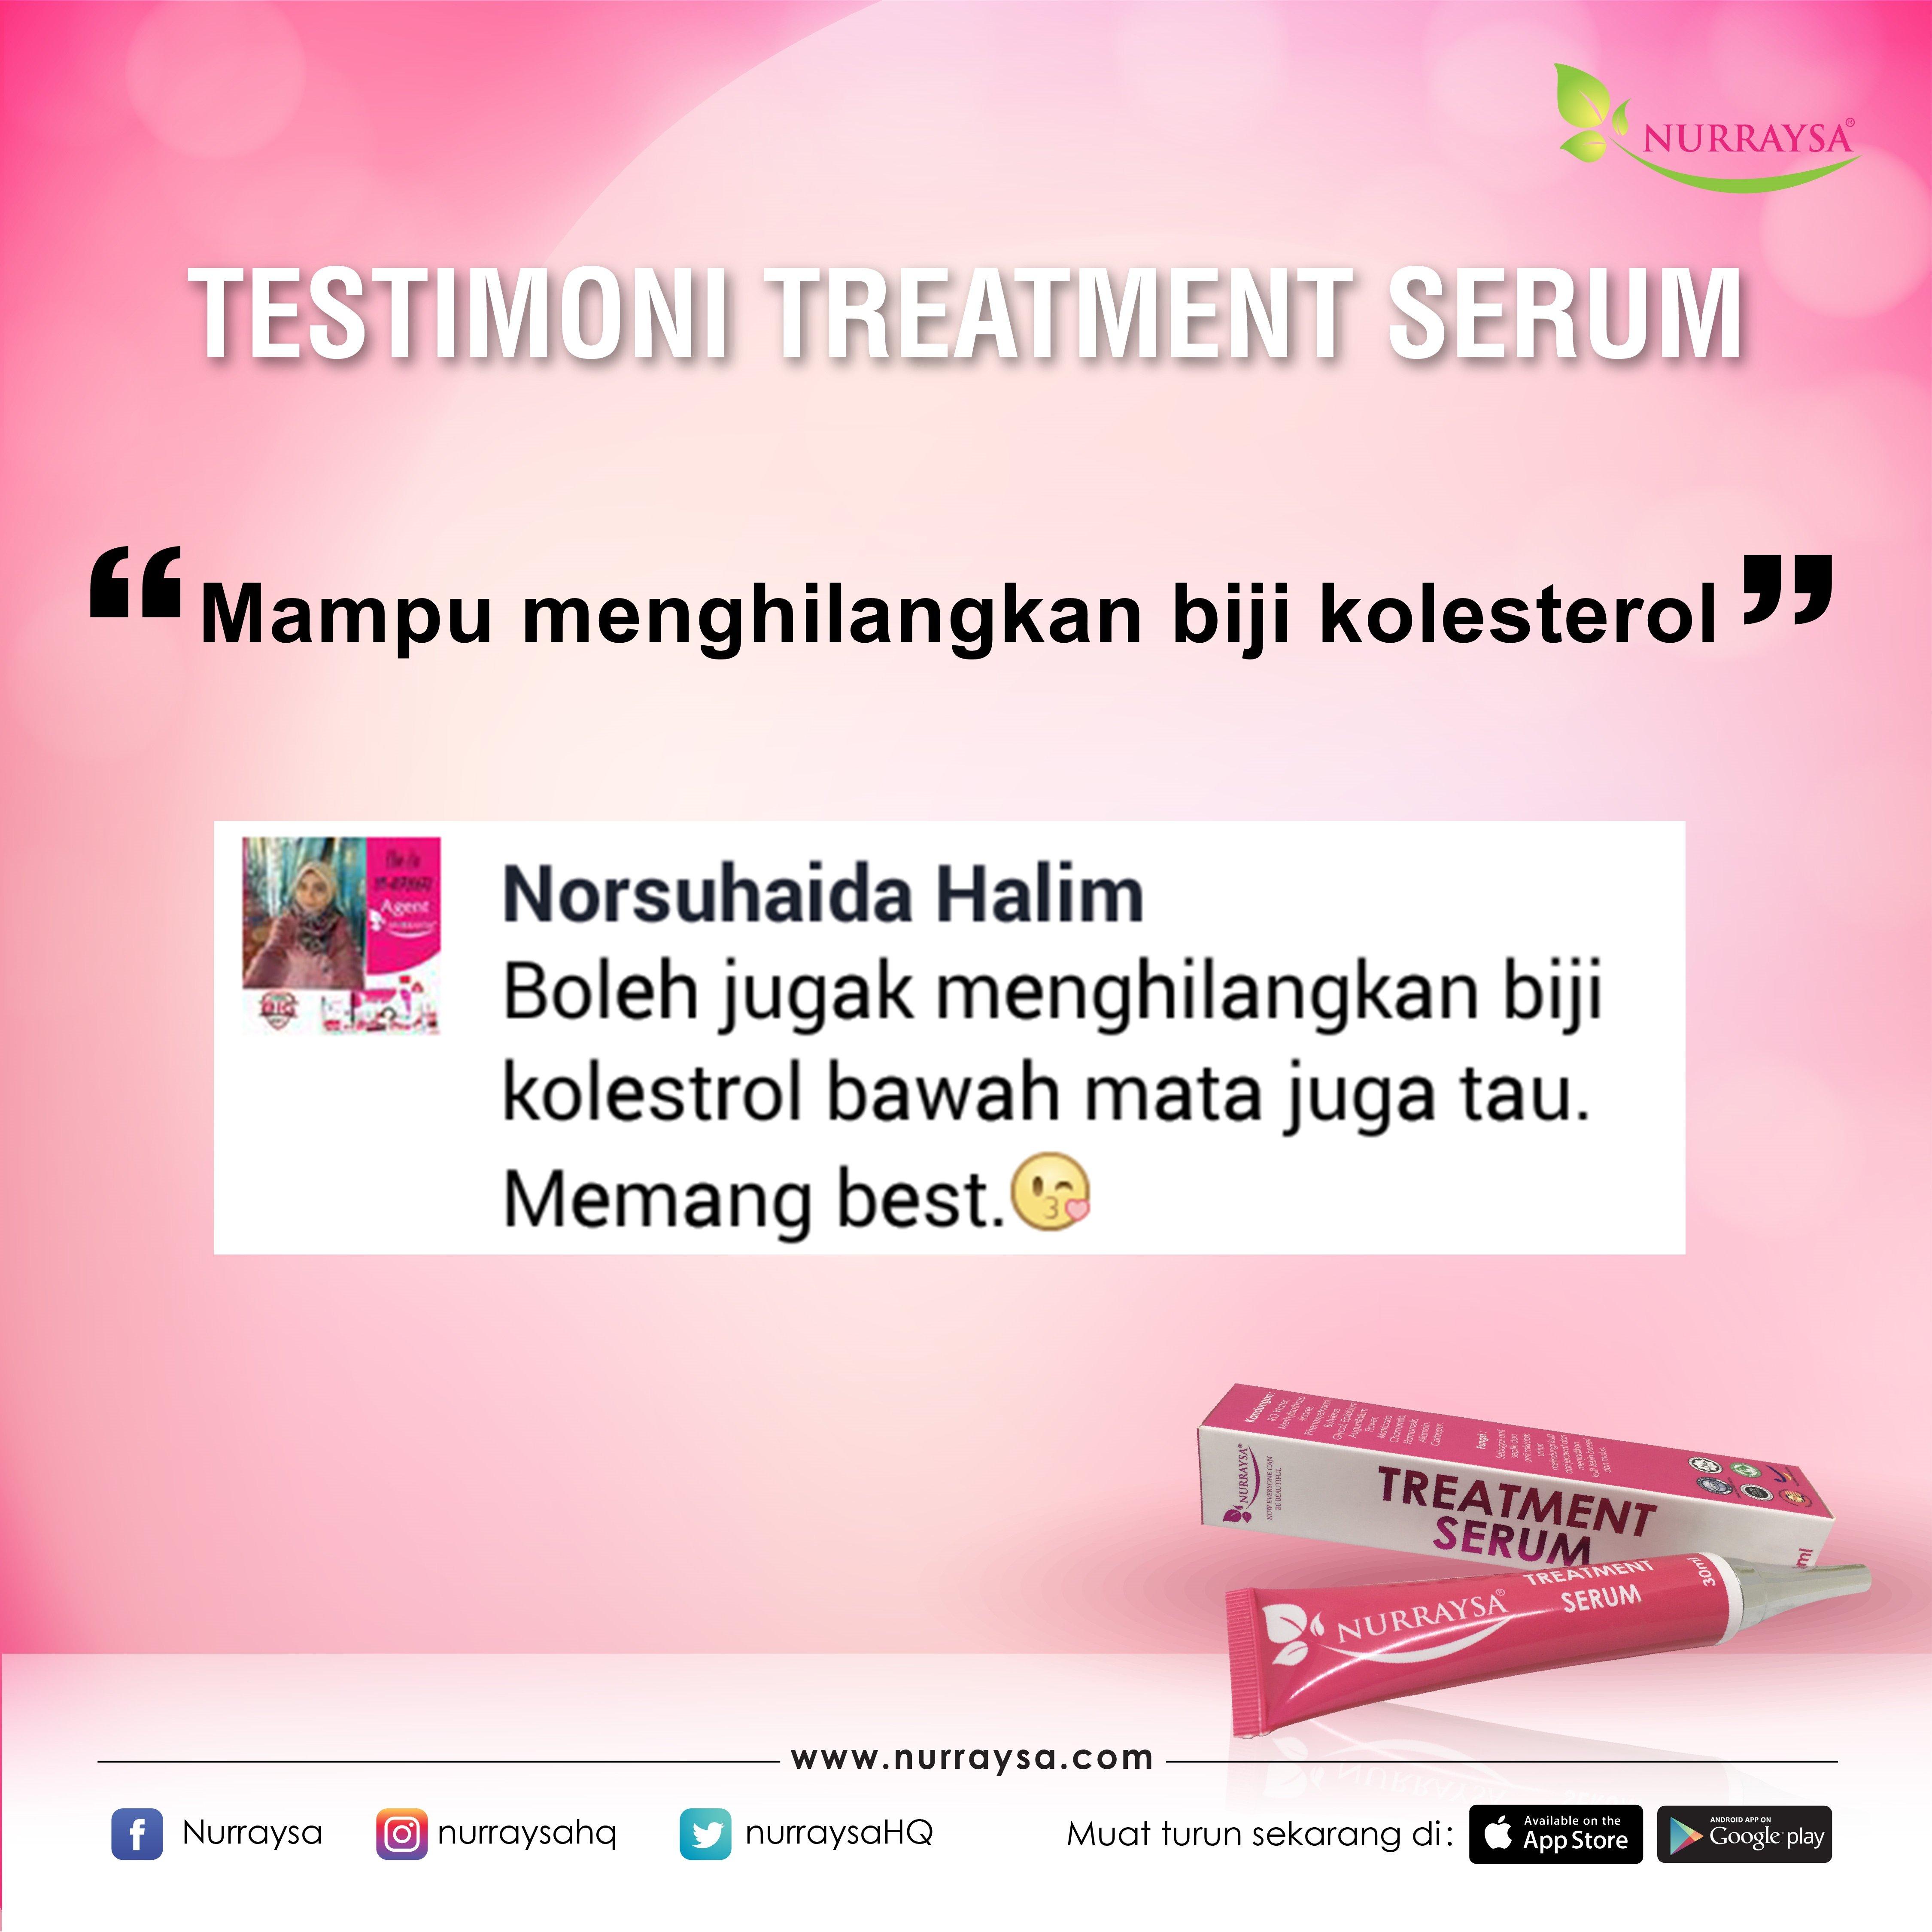 Testimoni Treatment Serum 1